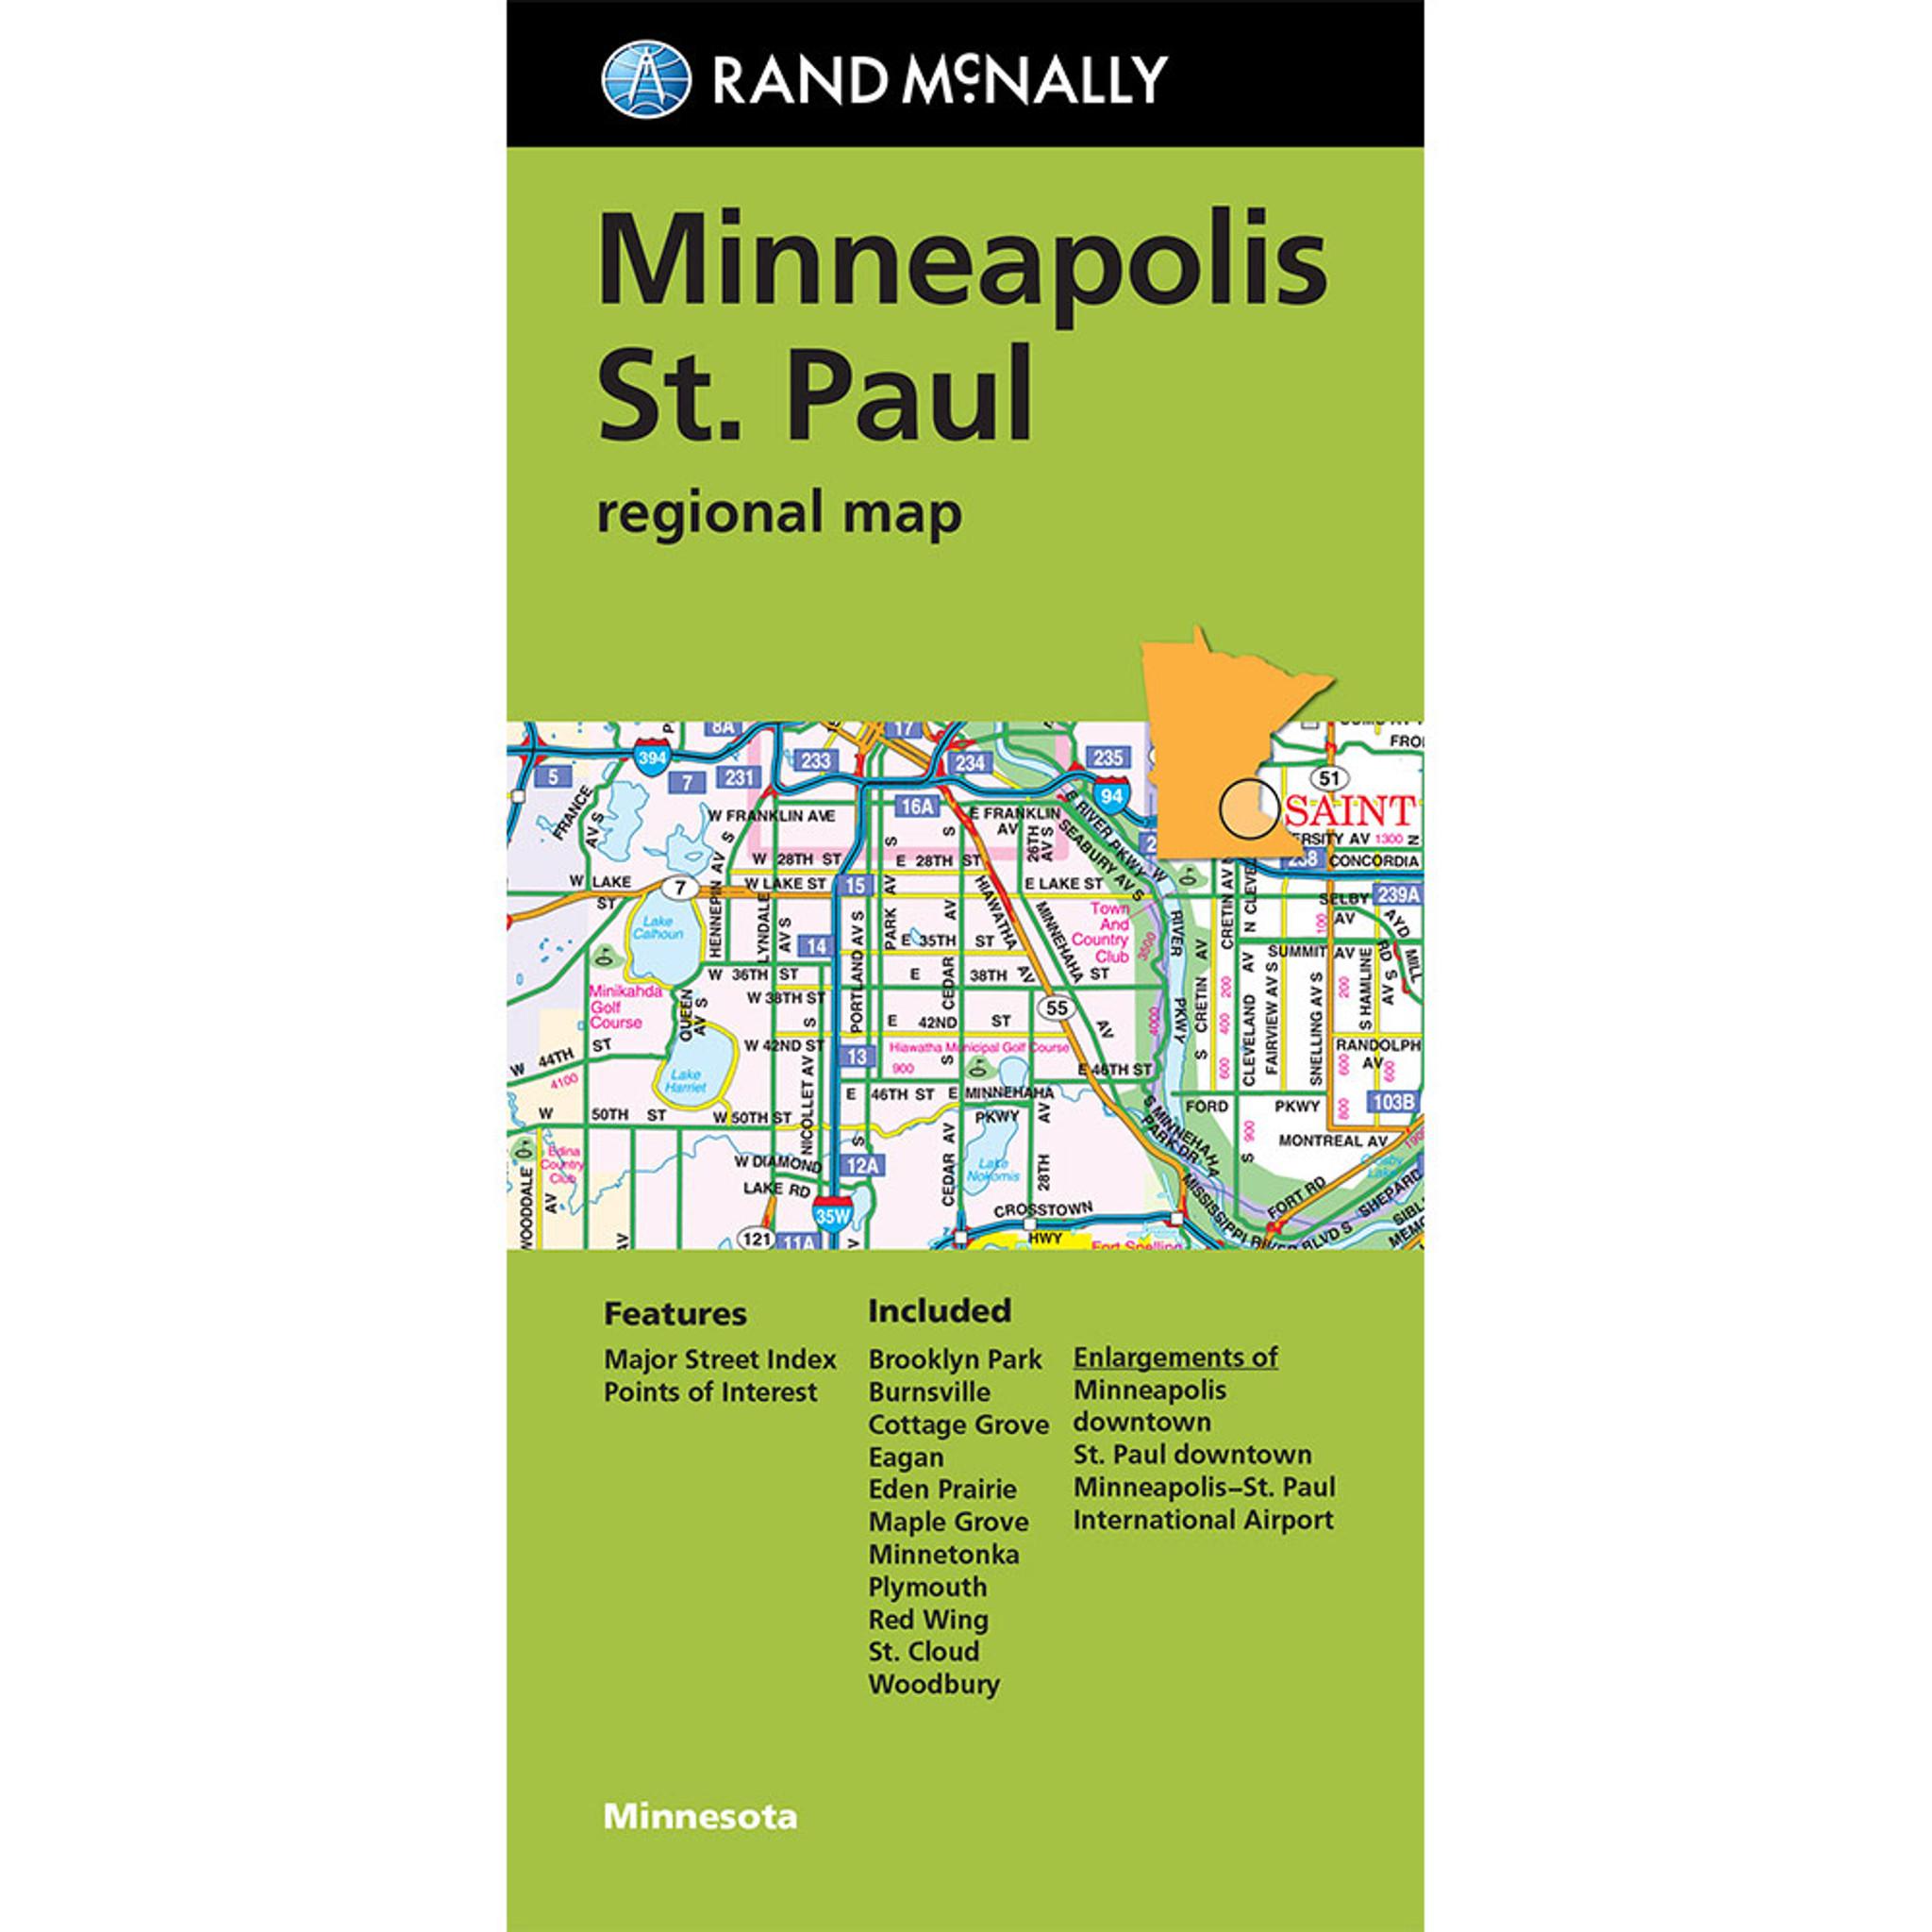 Folded Map: Minneapolis St. Paul Regional Map on mall of america, bloomington map, hennepin county map, university of minnesota, des moines, monroe map, usa map, cleveland map, milwaukee map, calgary canada map, target center, la crosse map, saint paul, minnesota twins, wisconsin map, mn map, duluth map, minnesota map, st paul map, san antonio, pittsburgh map, san jose map, sioux falls, united states map, twin cities map, seattle map, minneapolis-st. paul, eden prairie map, minnetonka map,